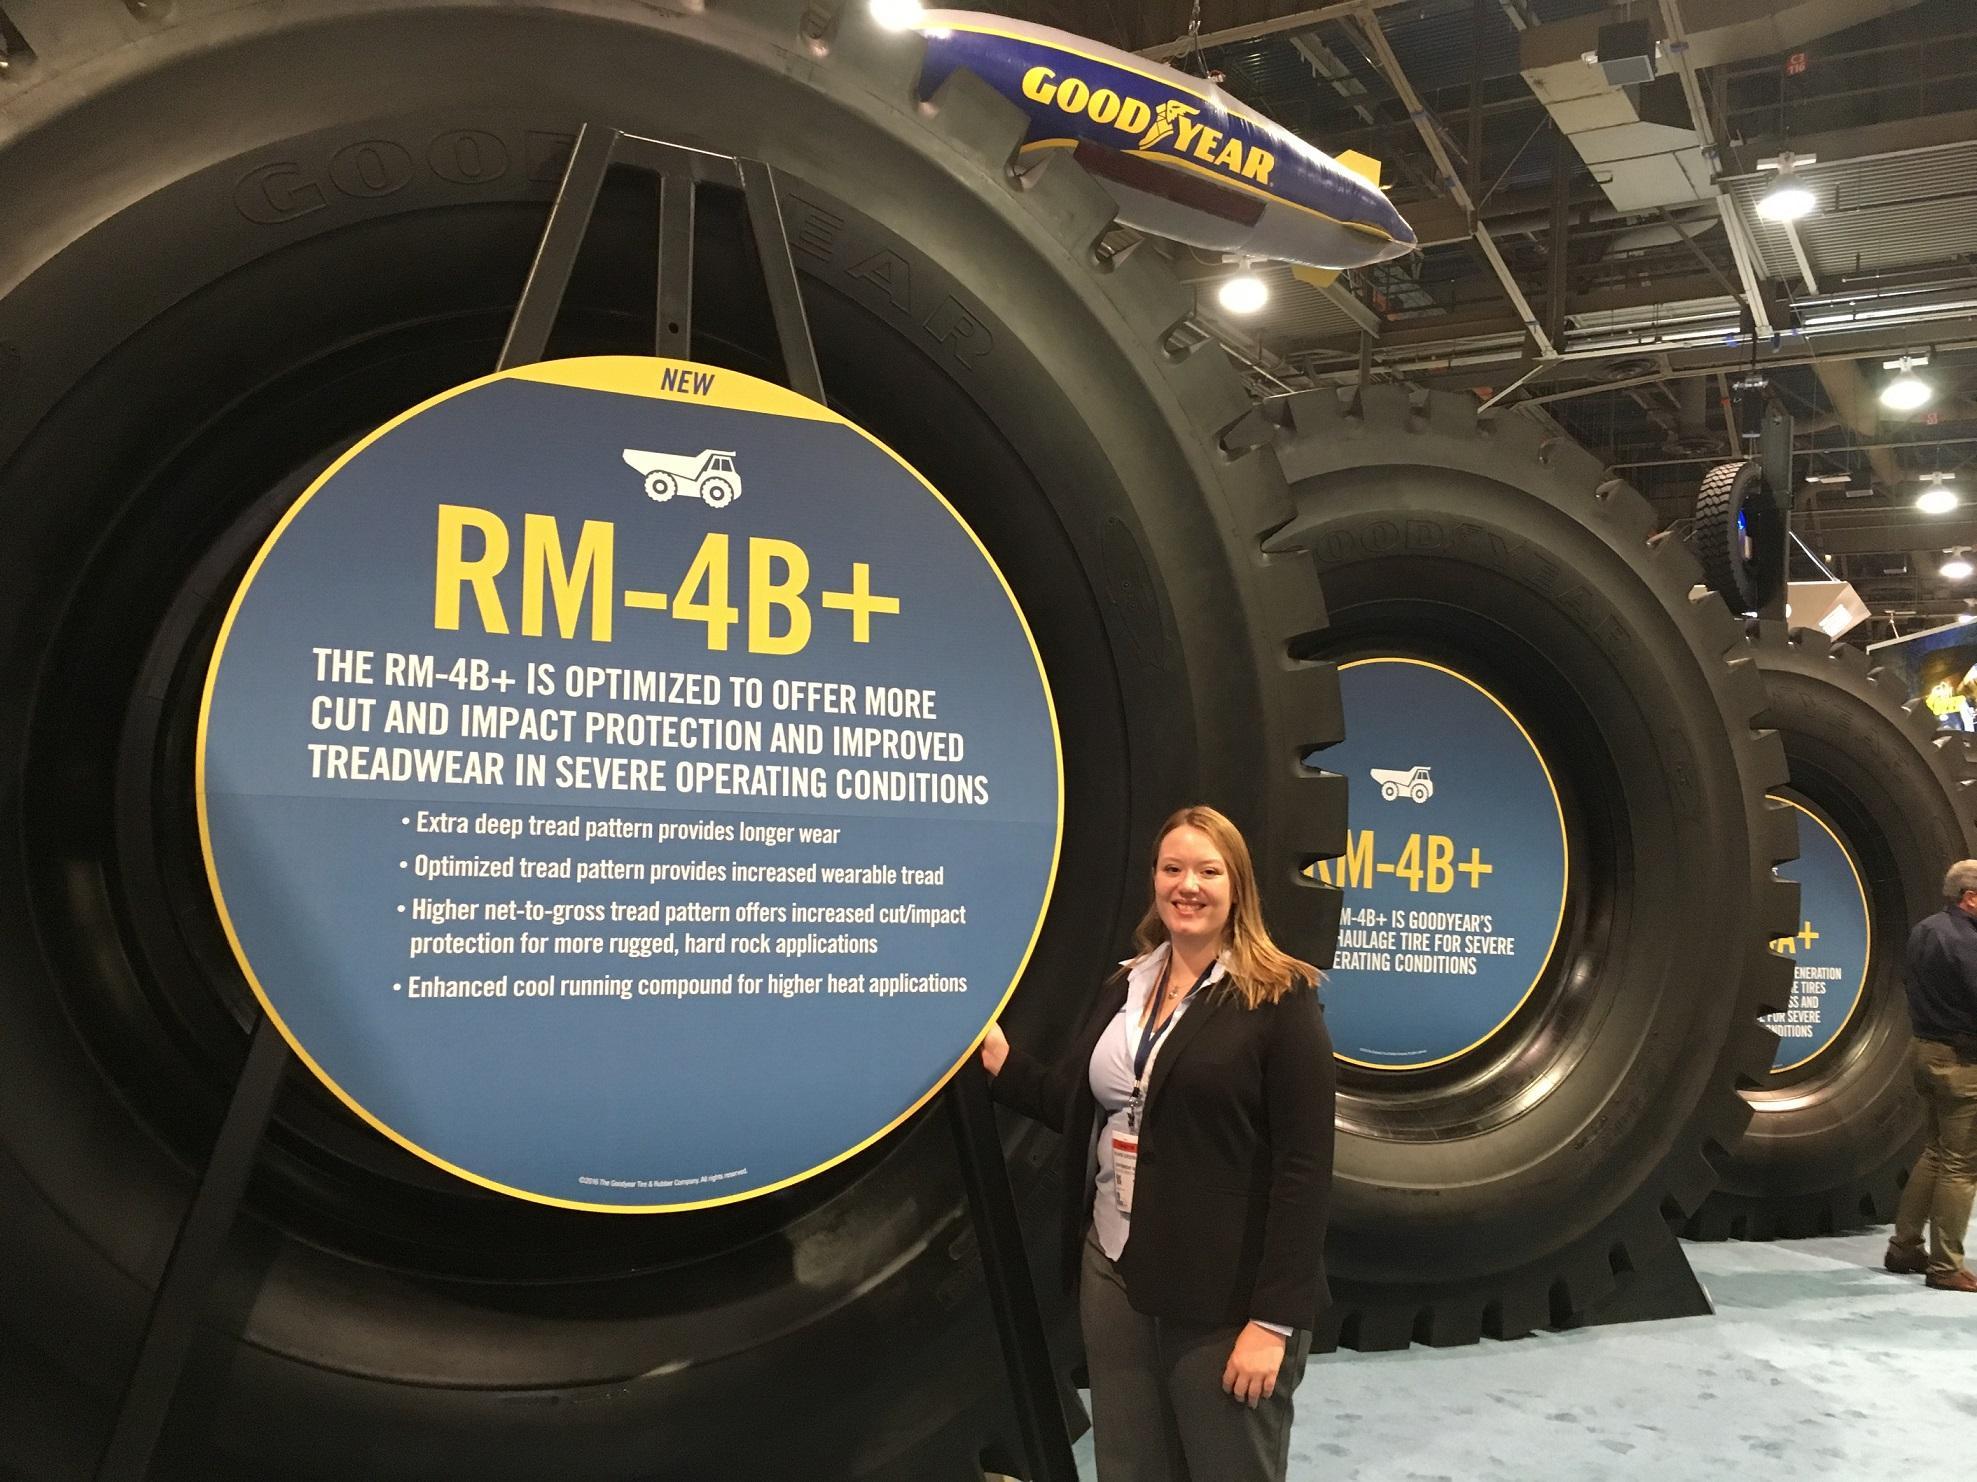 Goodyear представил новые OTR-шины RM-4B+ в регионе EMEA